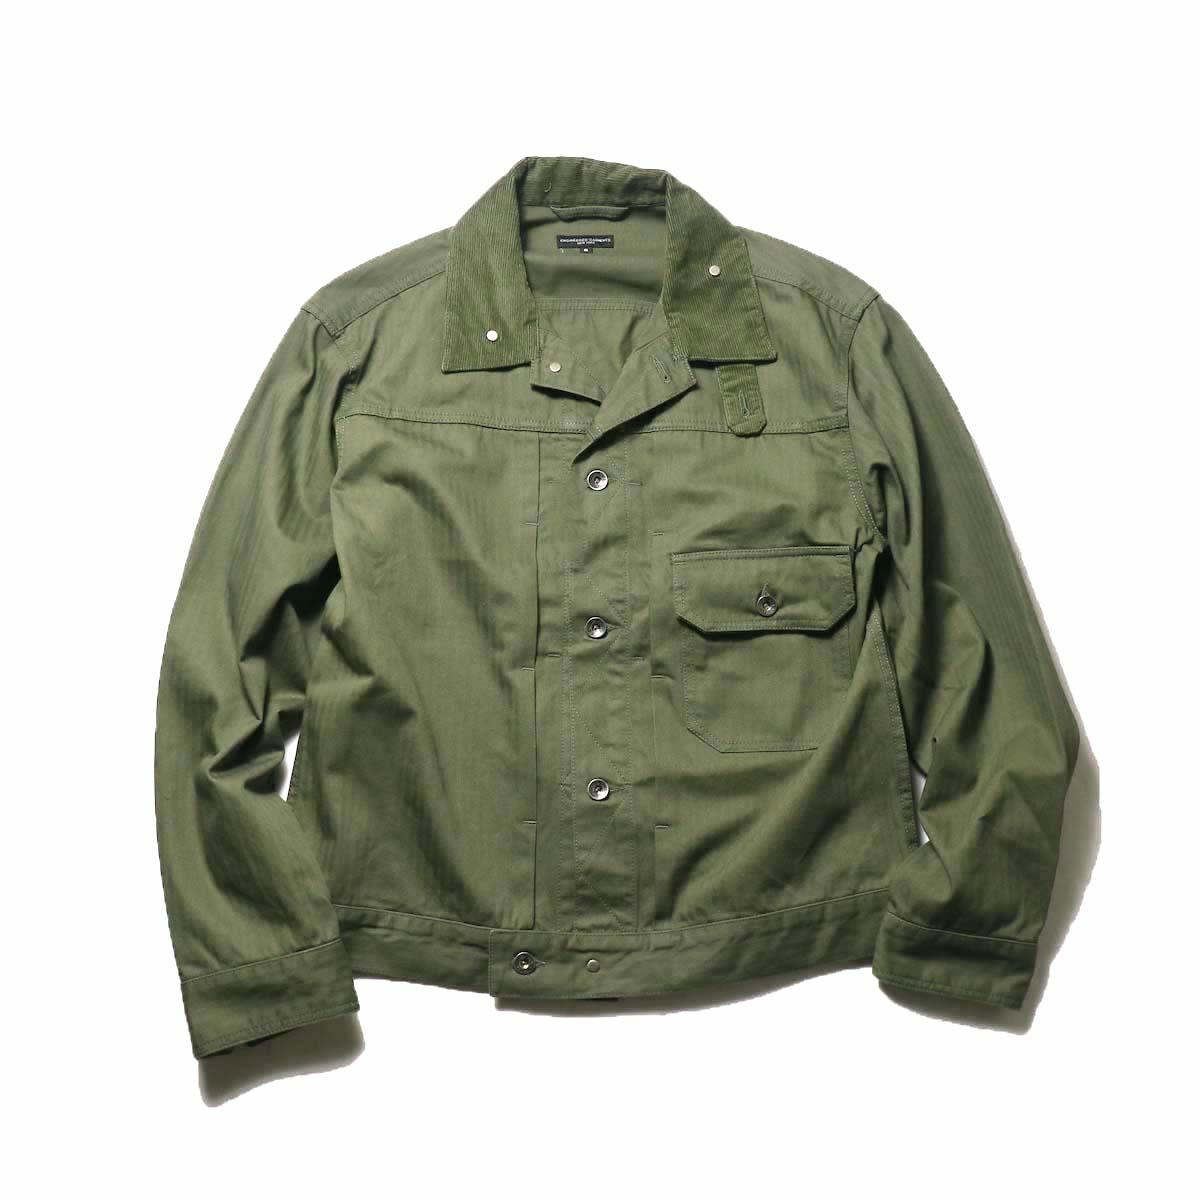 Engineered Garments / Trucker Jacket -Hb Twill (Olive)